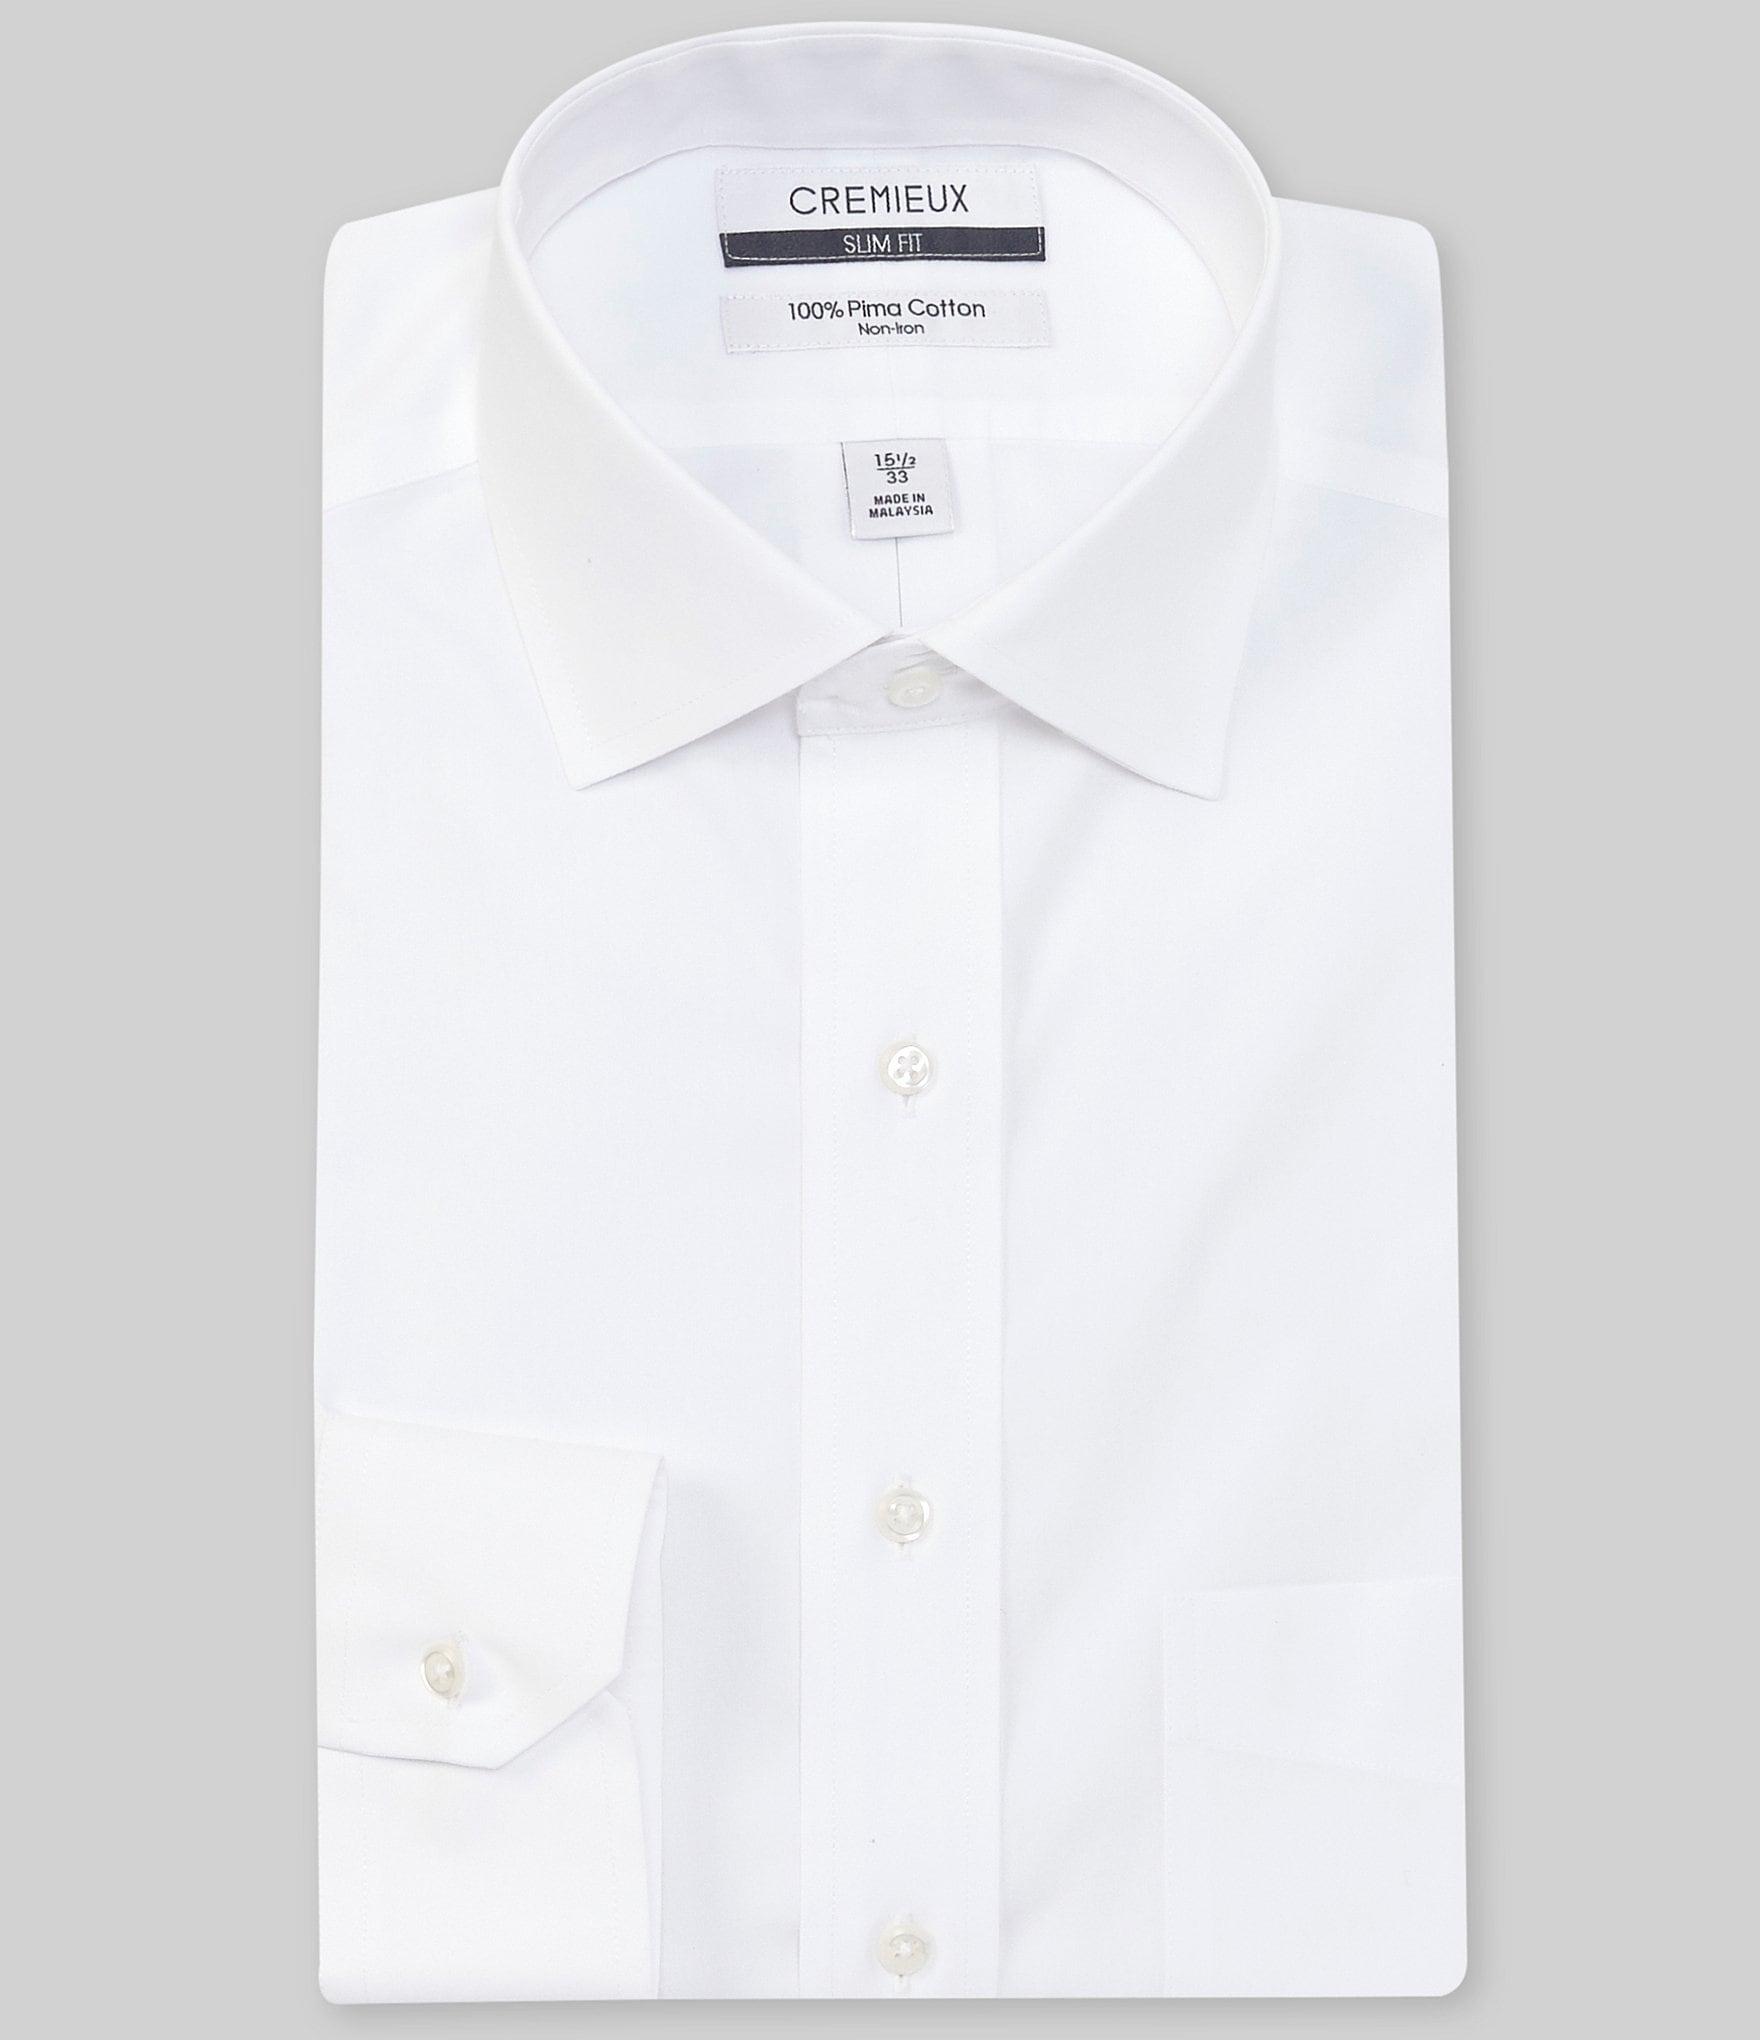 Cremieux Non Iron Slim Fit Spread Collar Solid Dress Shirt